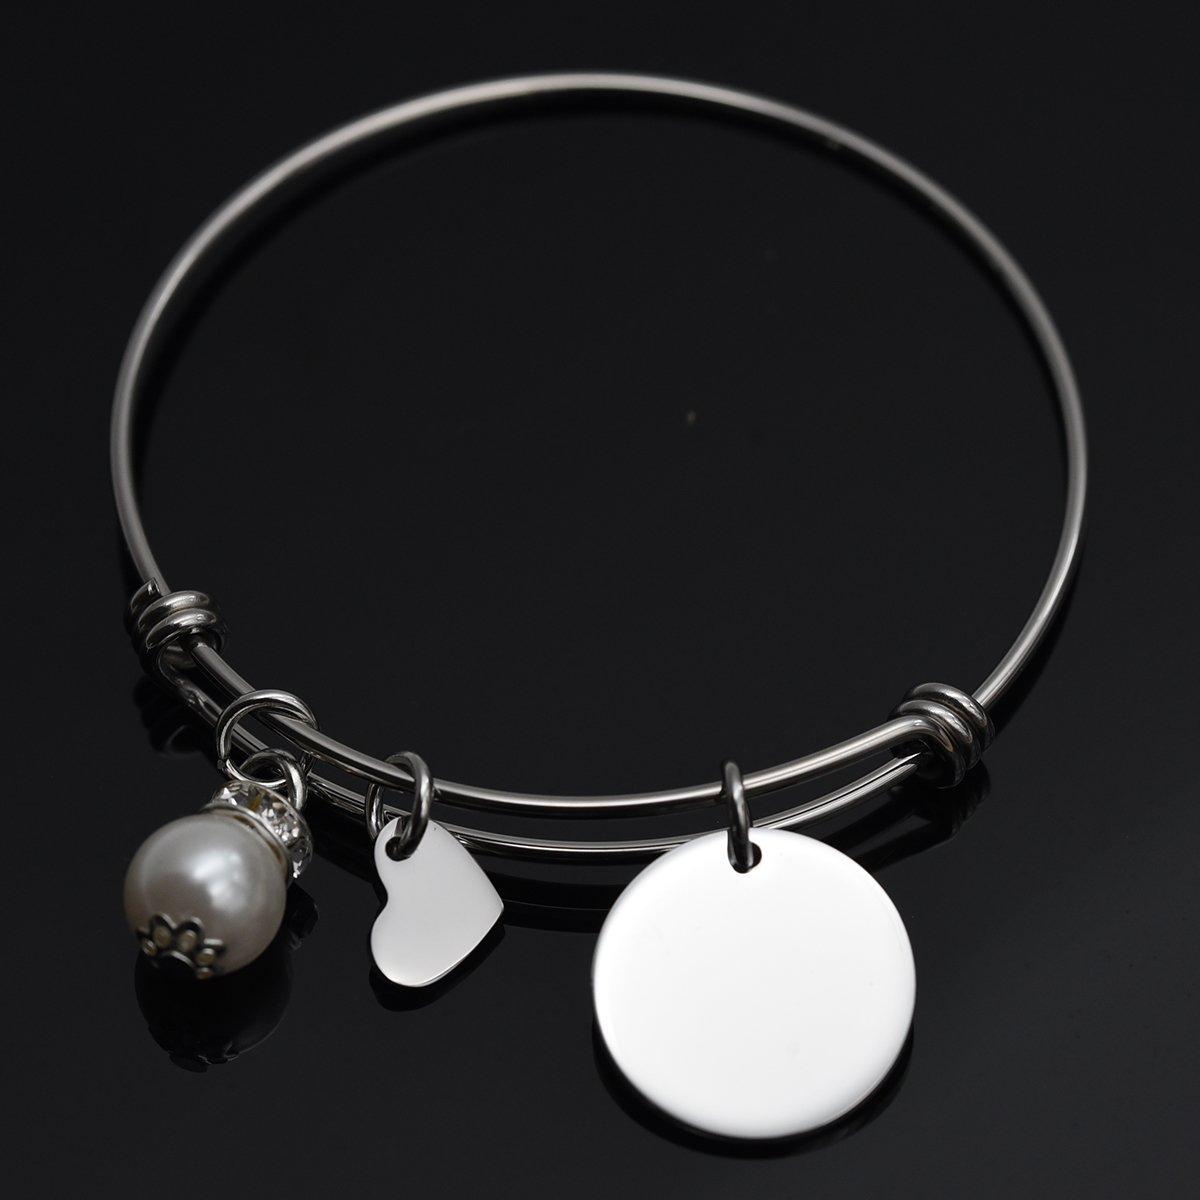 Remember I Love You Mom Bangle Bracelet (White) by LParkin (Image #5)